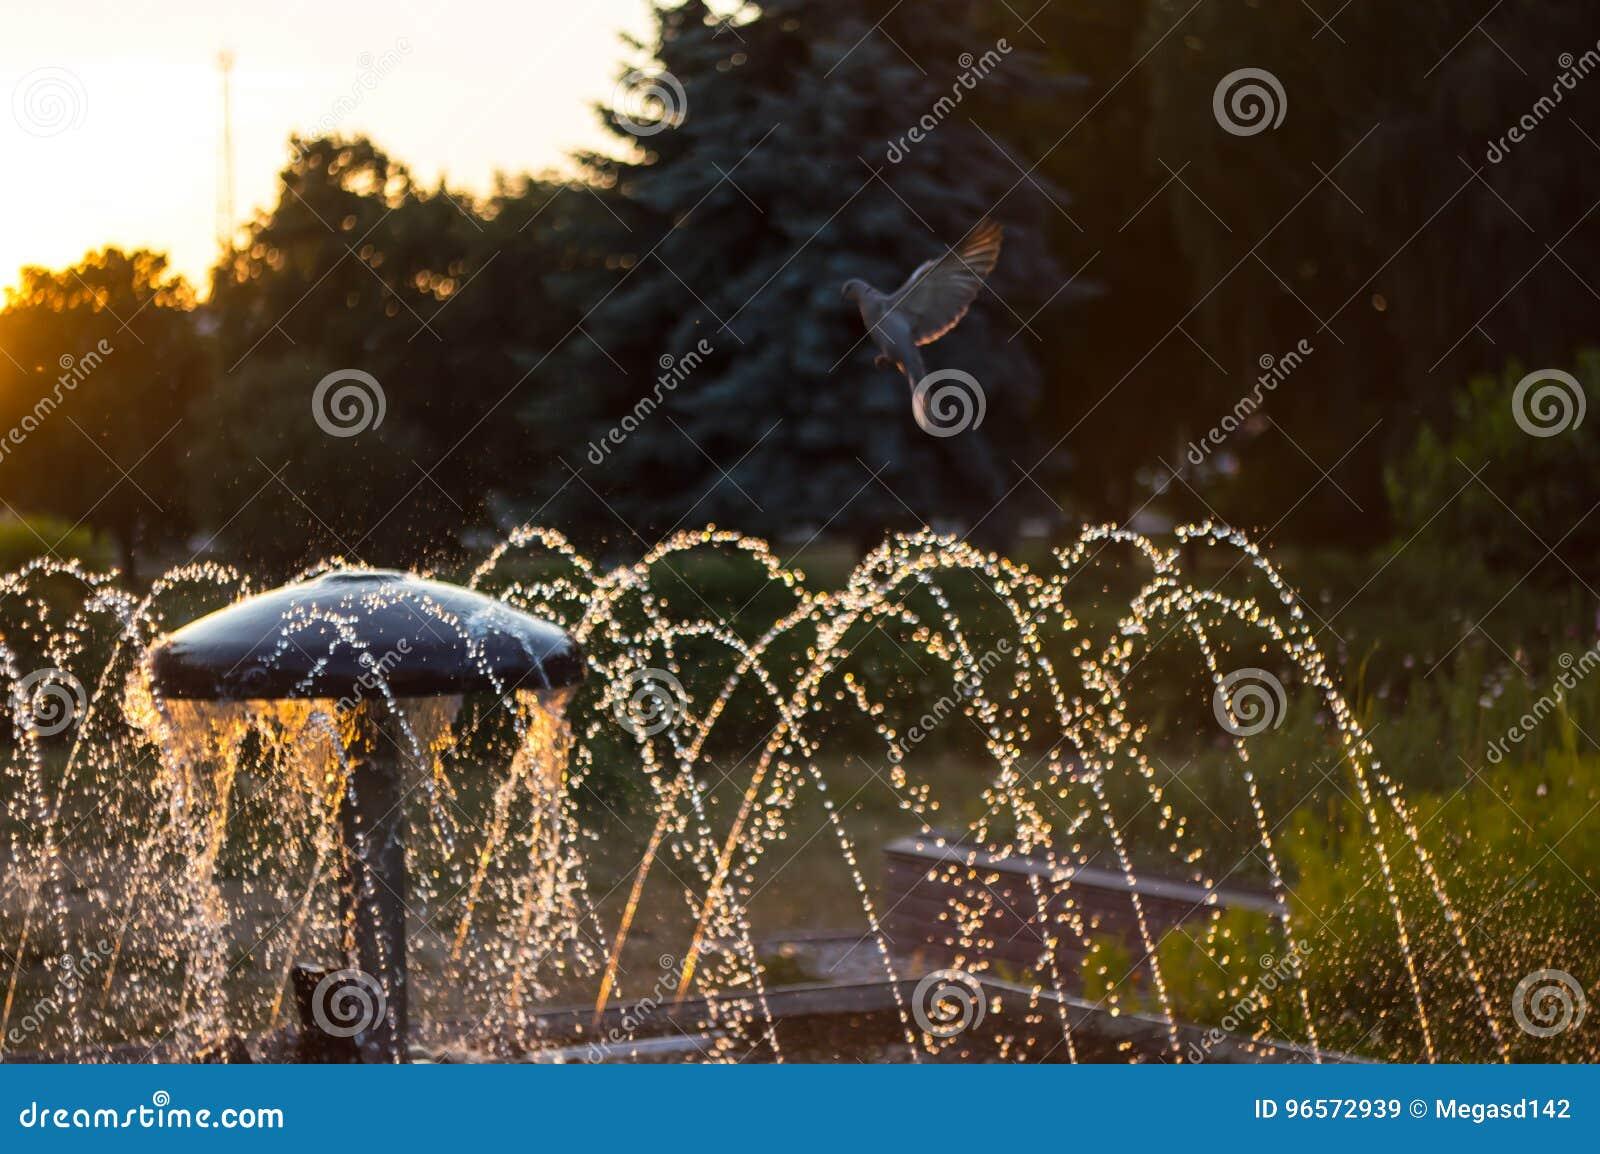 Fountain with turtledove